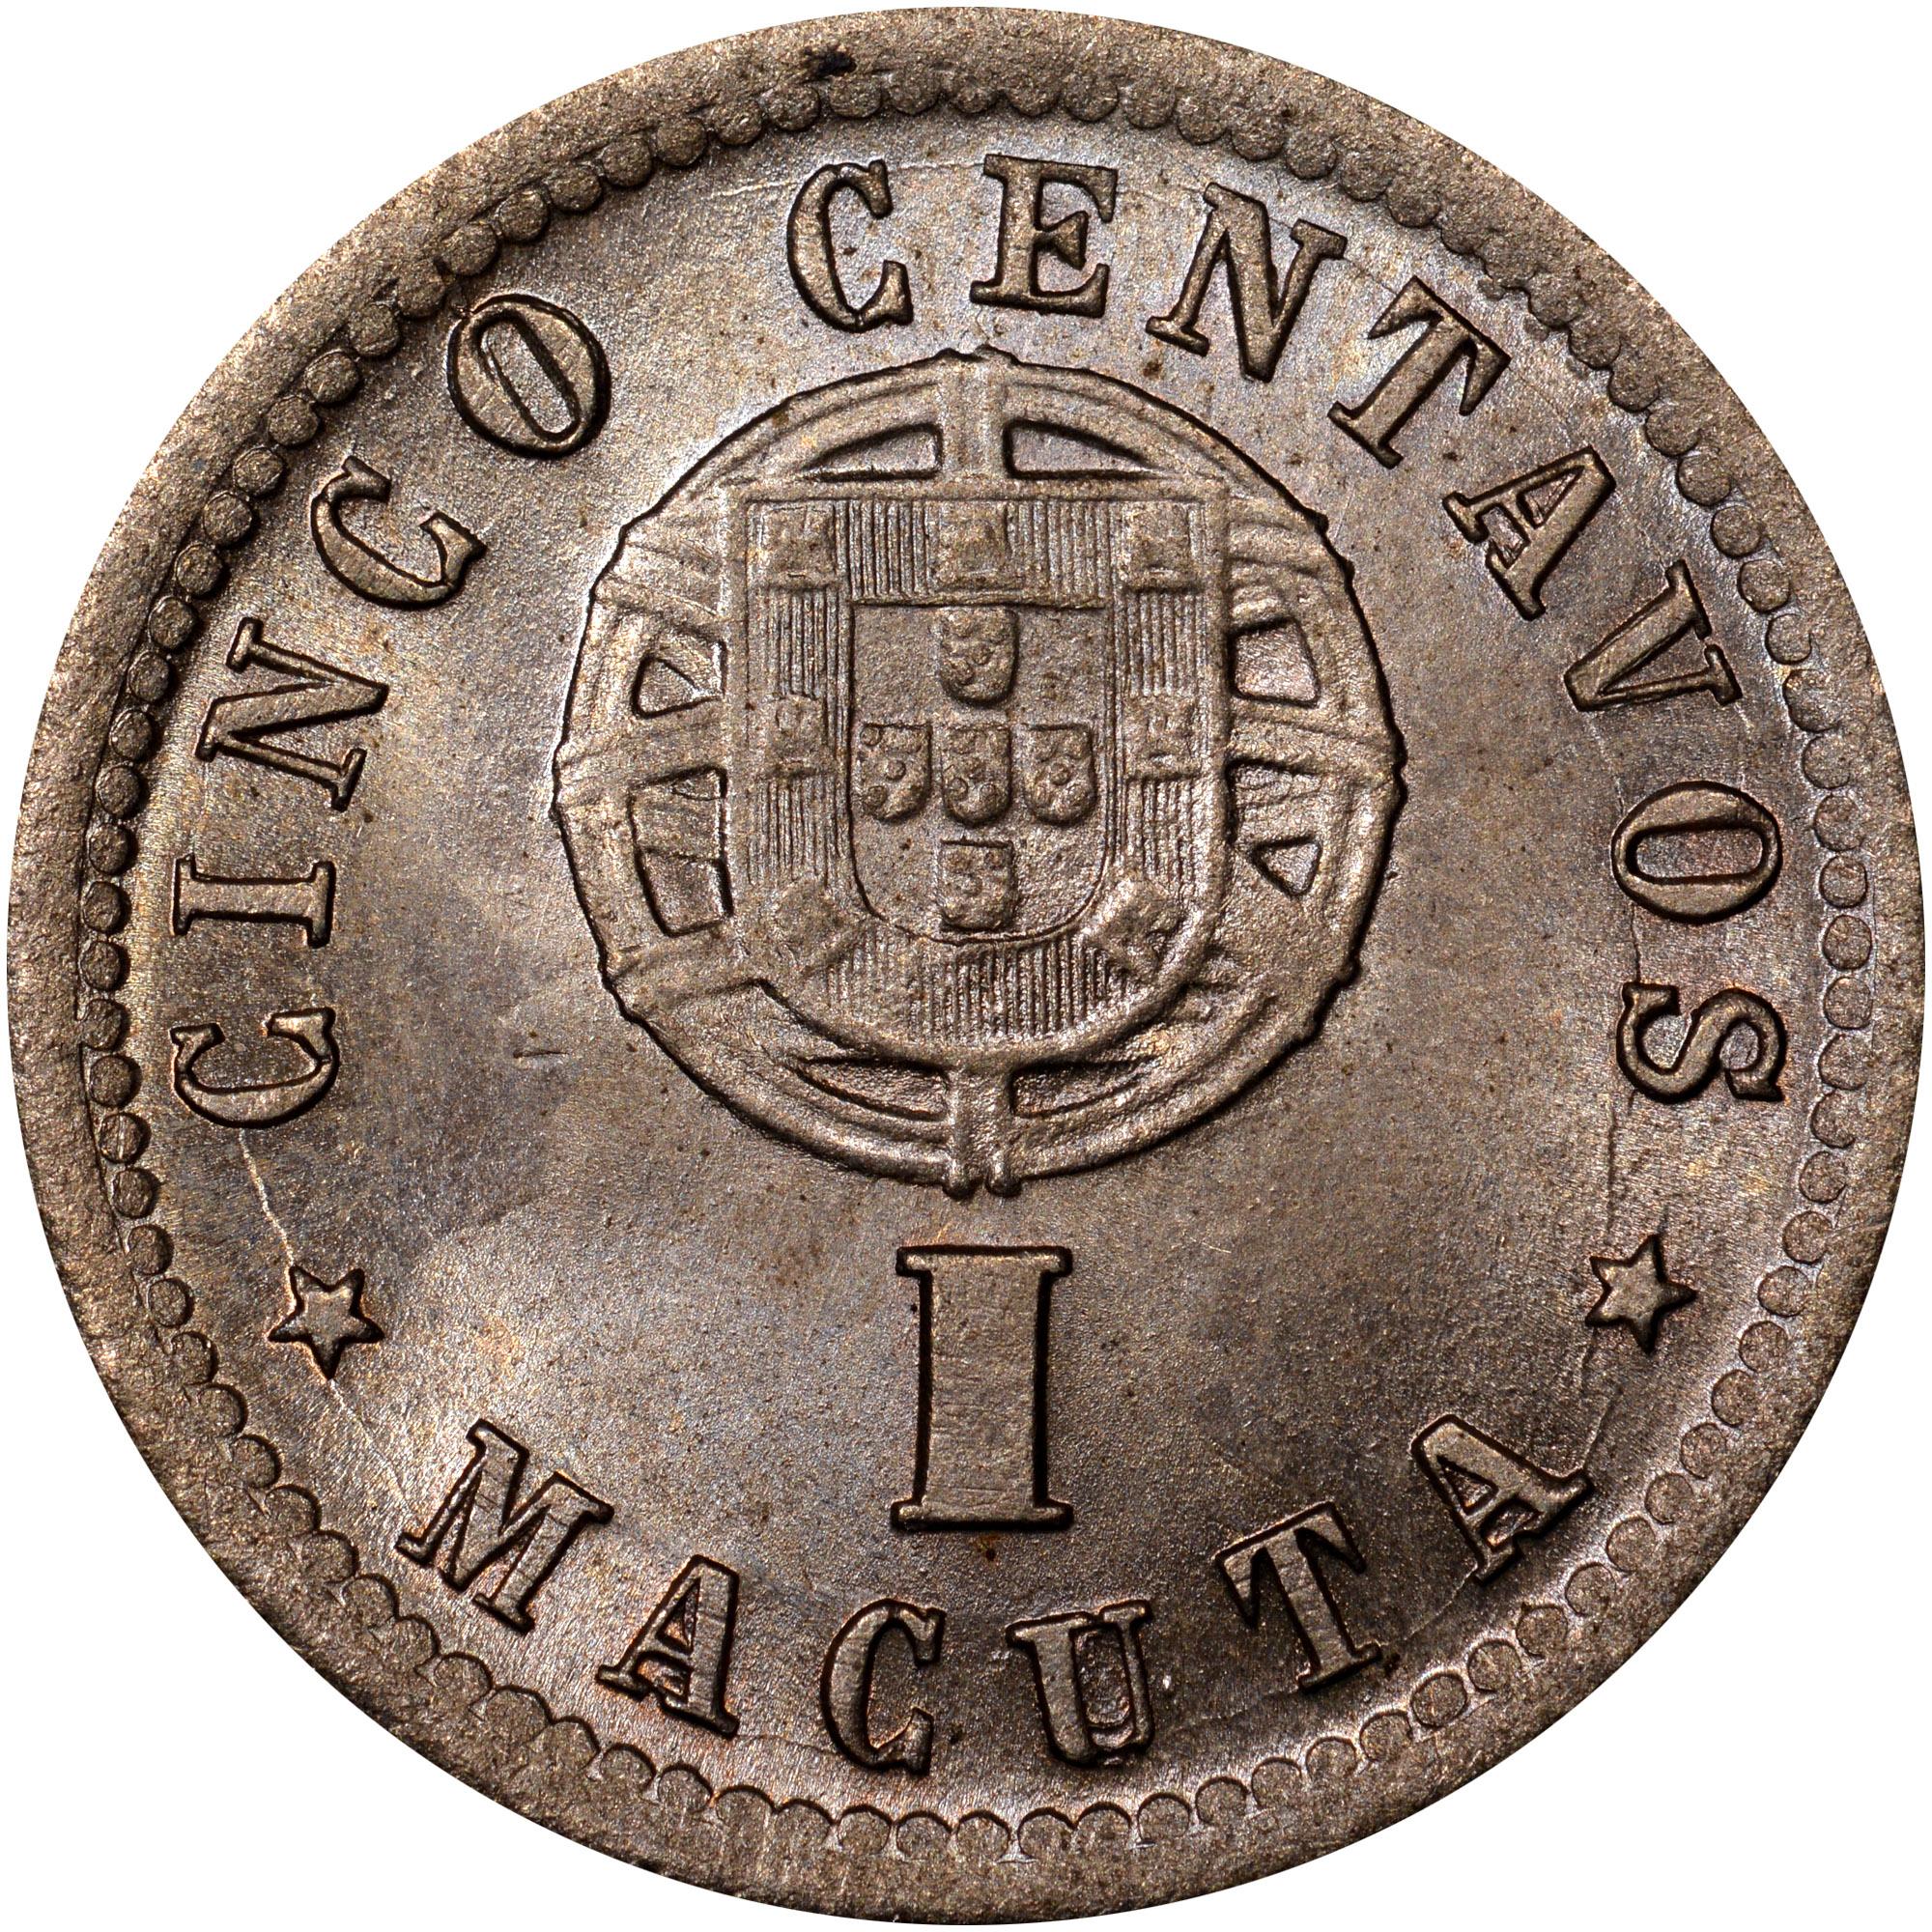 1927 Angola 5 Centavos, 1 Macuta reverse